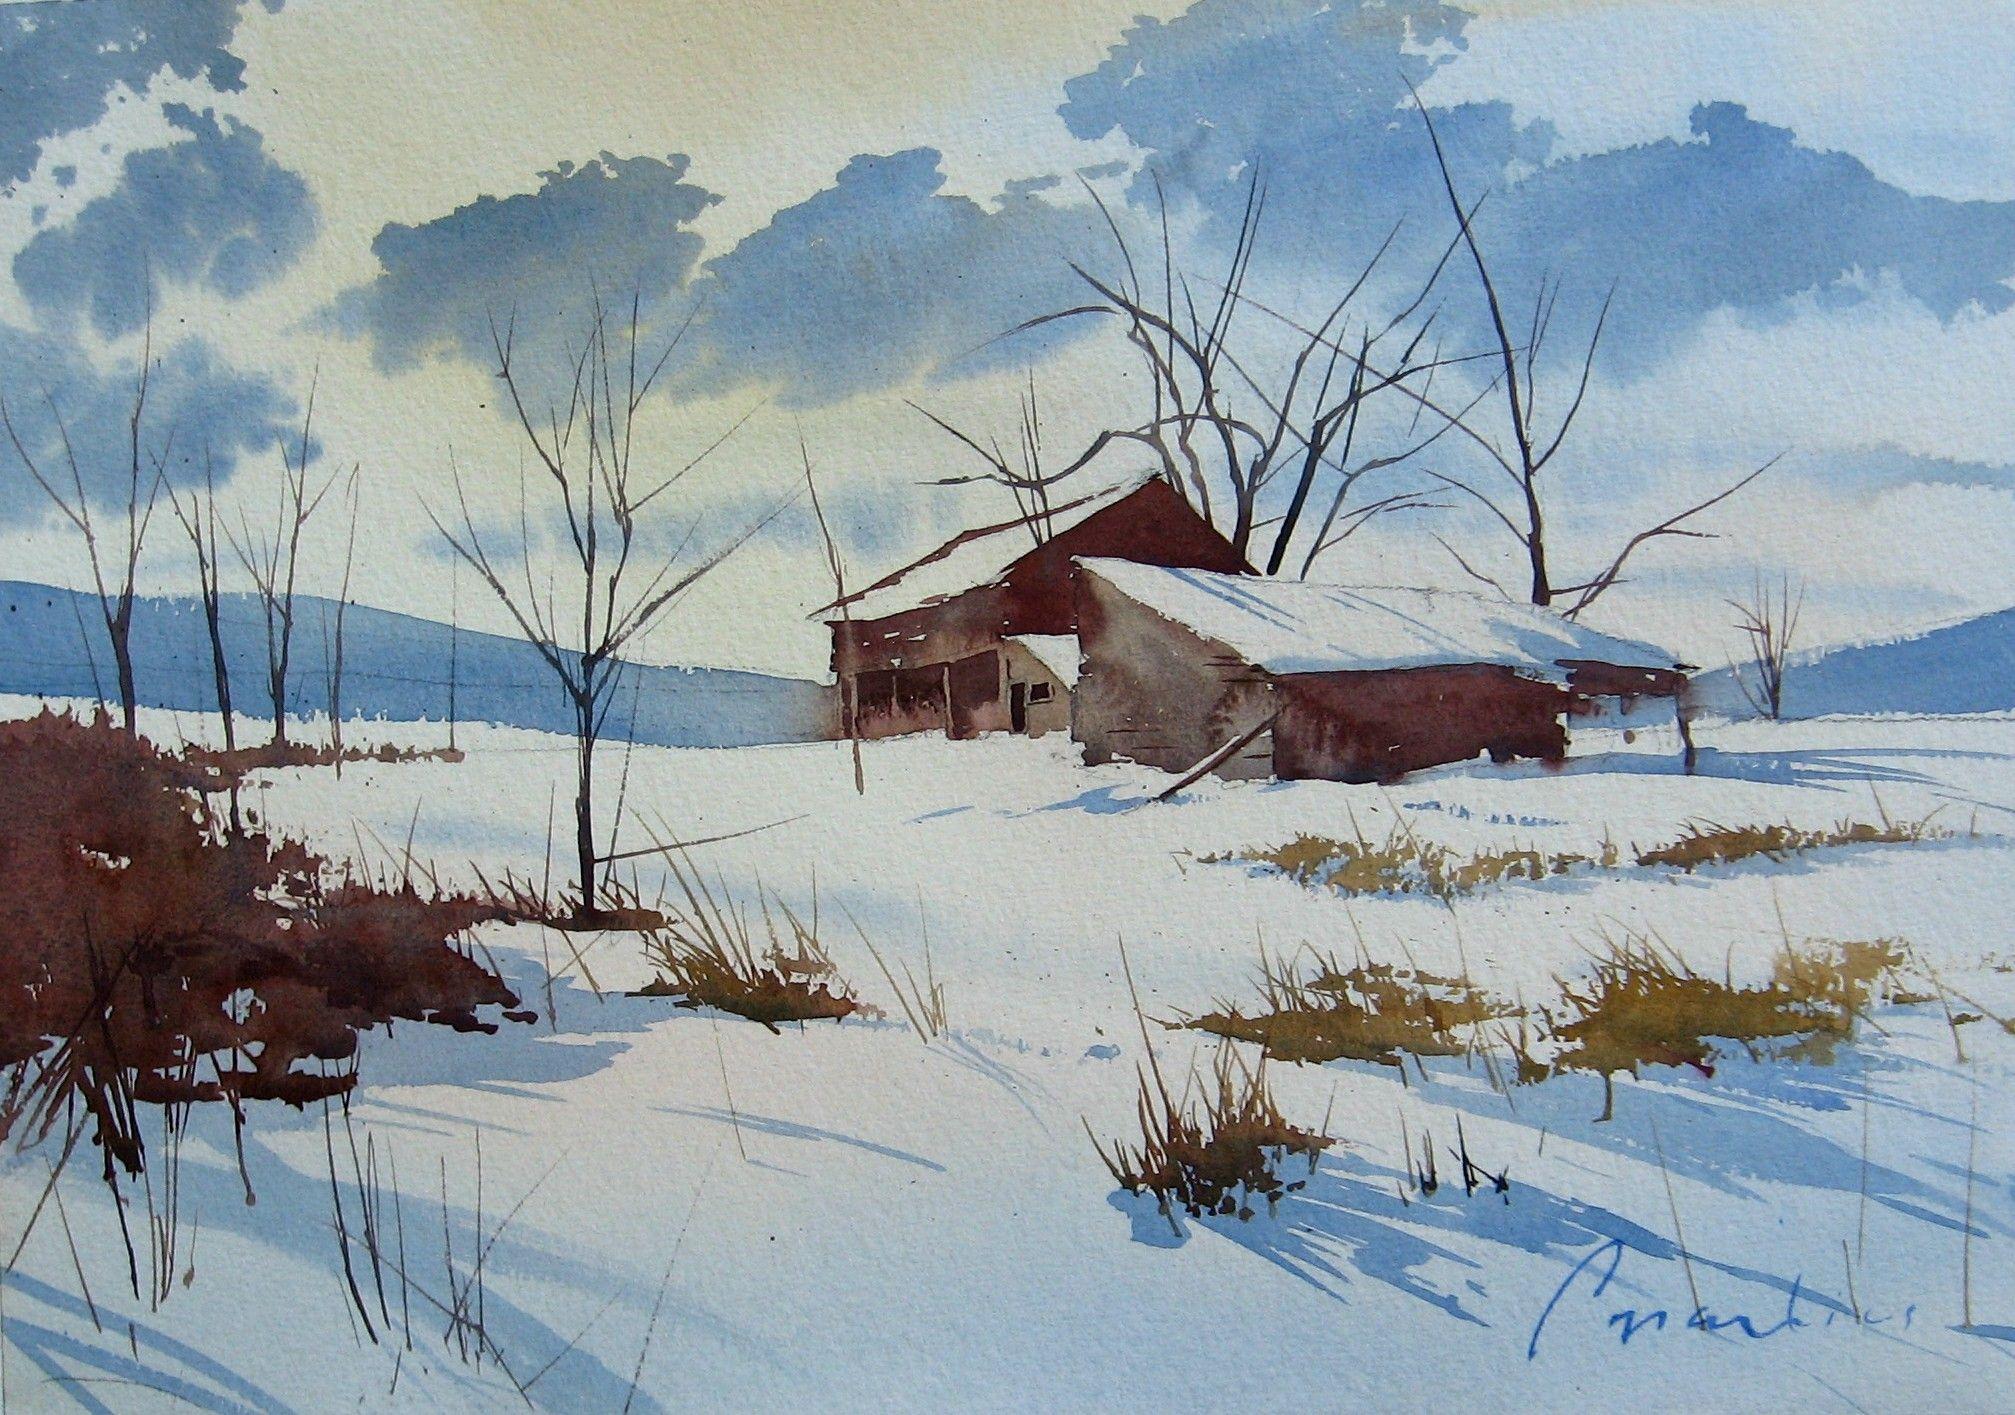 Vernon Barn- An Original Watercolor By Joel Popadics